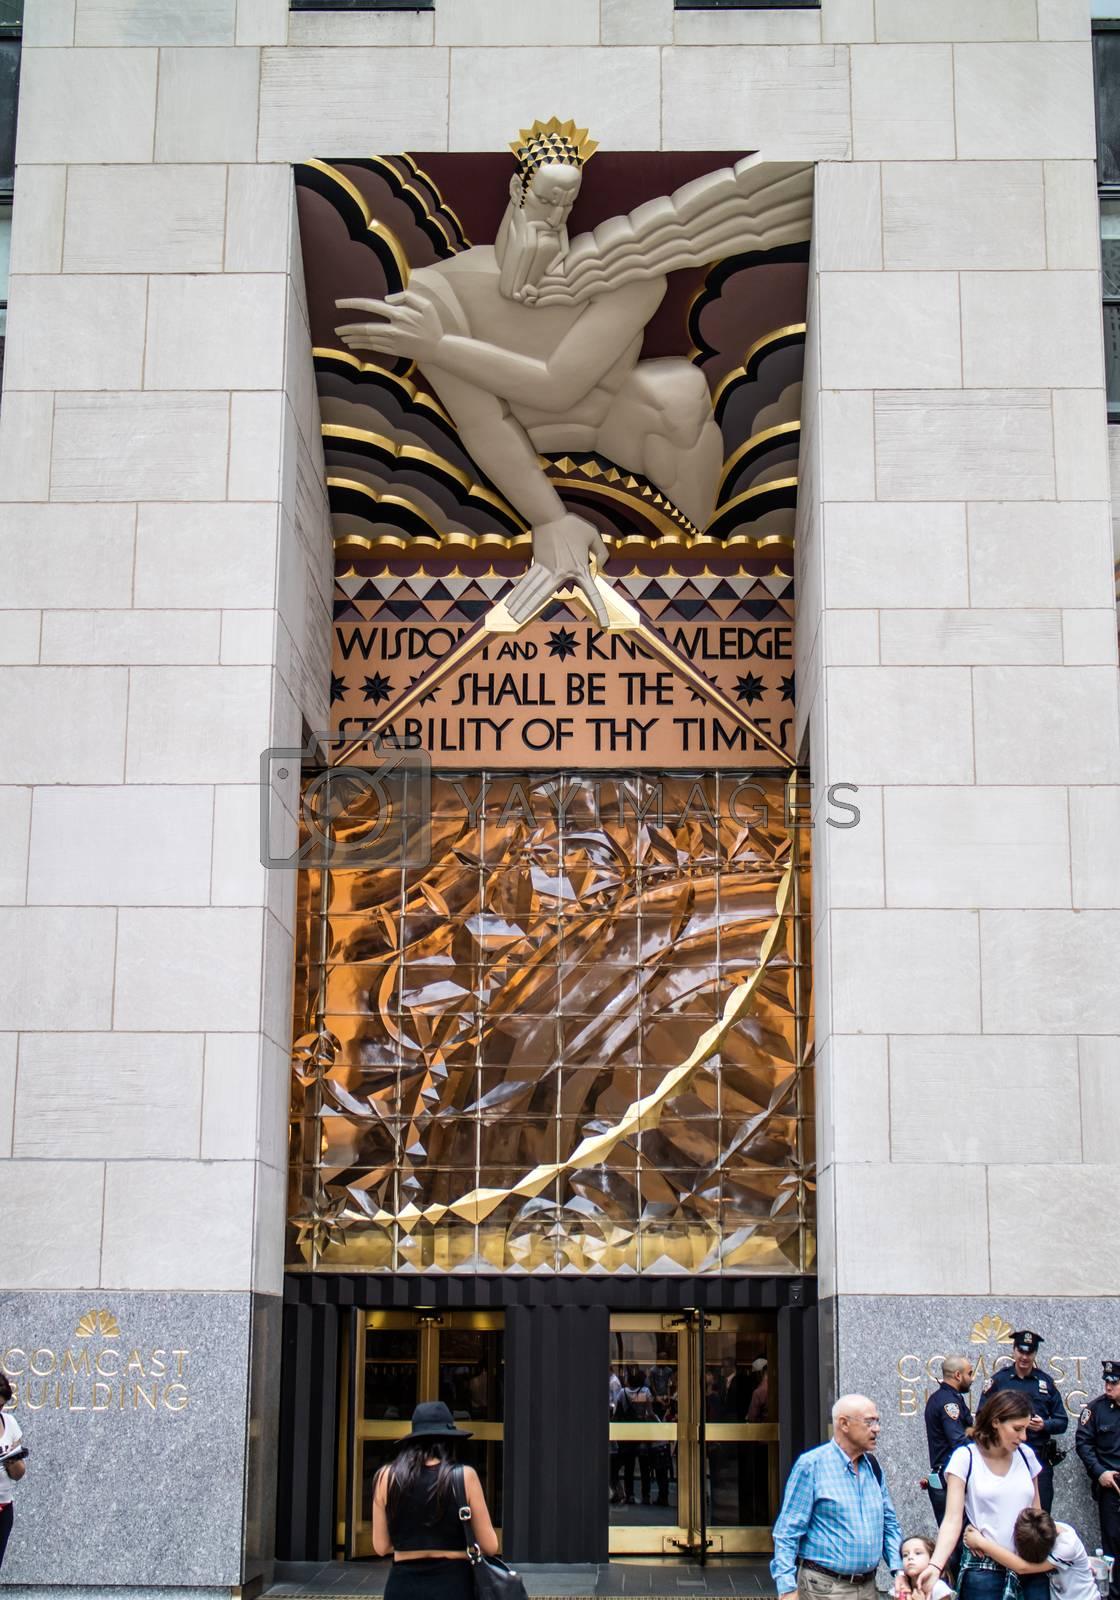 NEW YORK, USA, October 10, 2015: Unidentified people walking in front of Rockfeller Center building in Manhattan, New York.